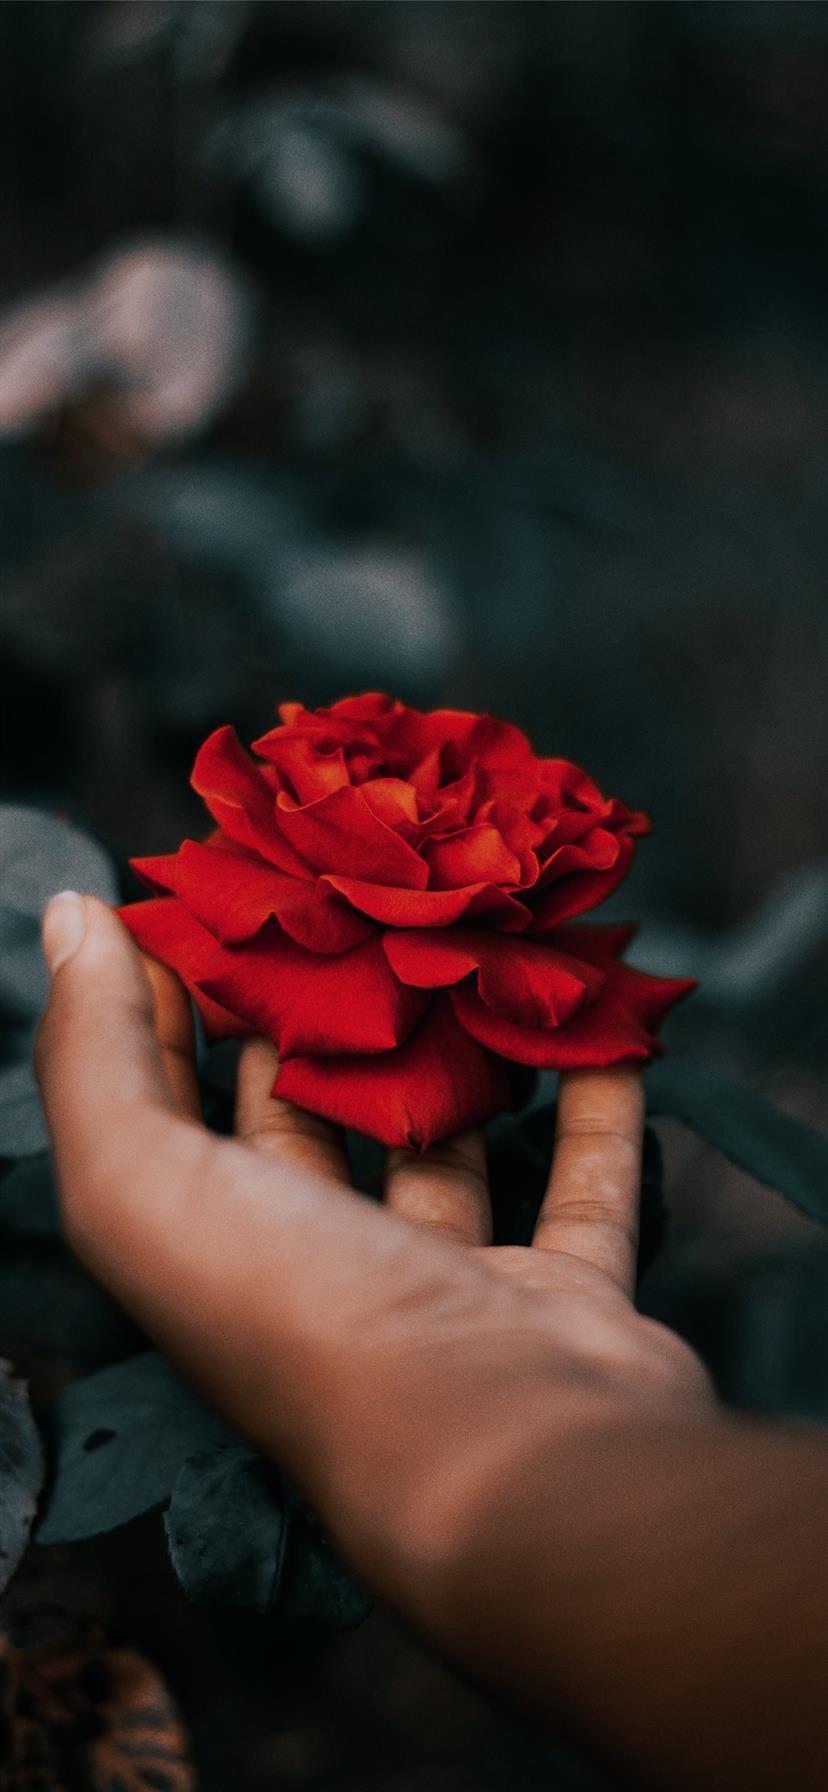 Best Rose Iphone 11 Wallpapers Hd Ilikewallpaper